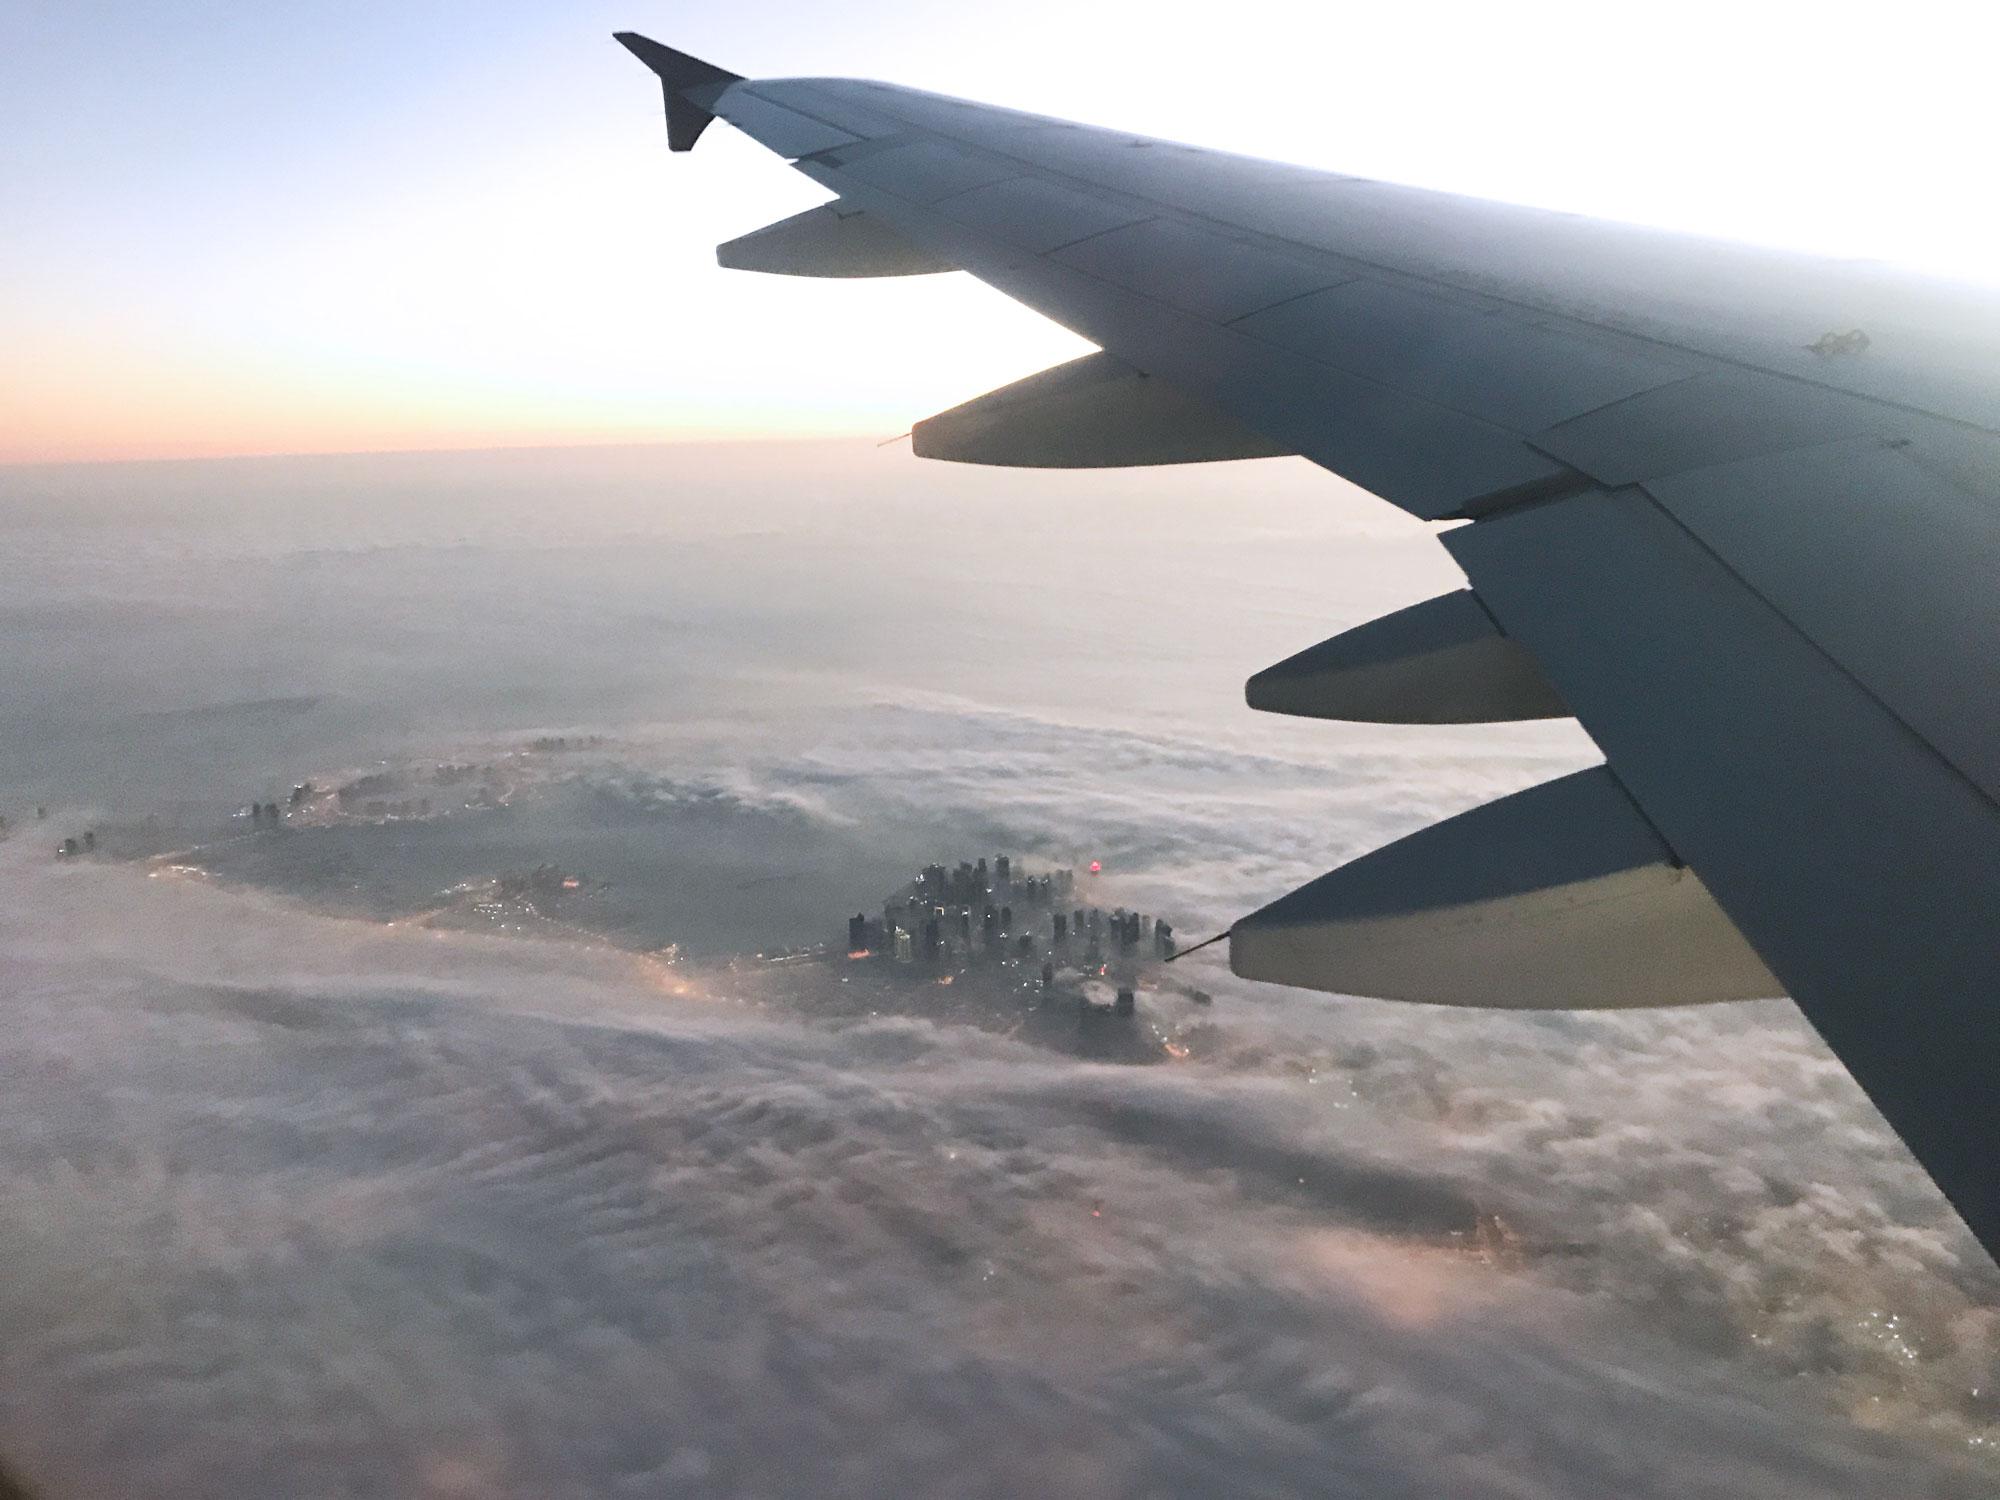 Qatar Airways cloud city - Helsinki to Doha - Blog - Travel - Screw Them All